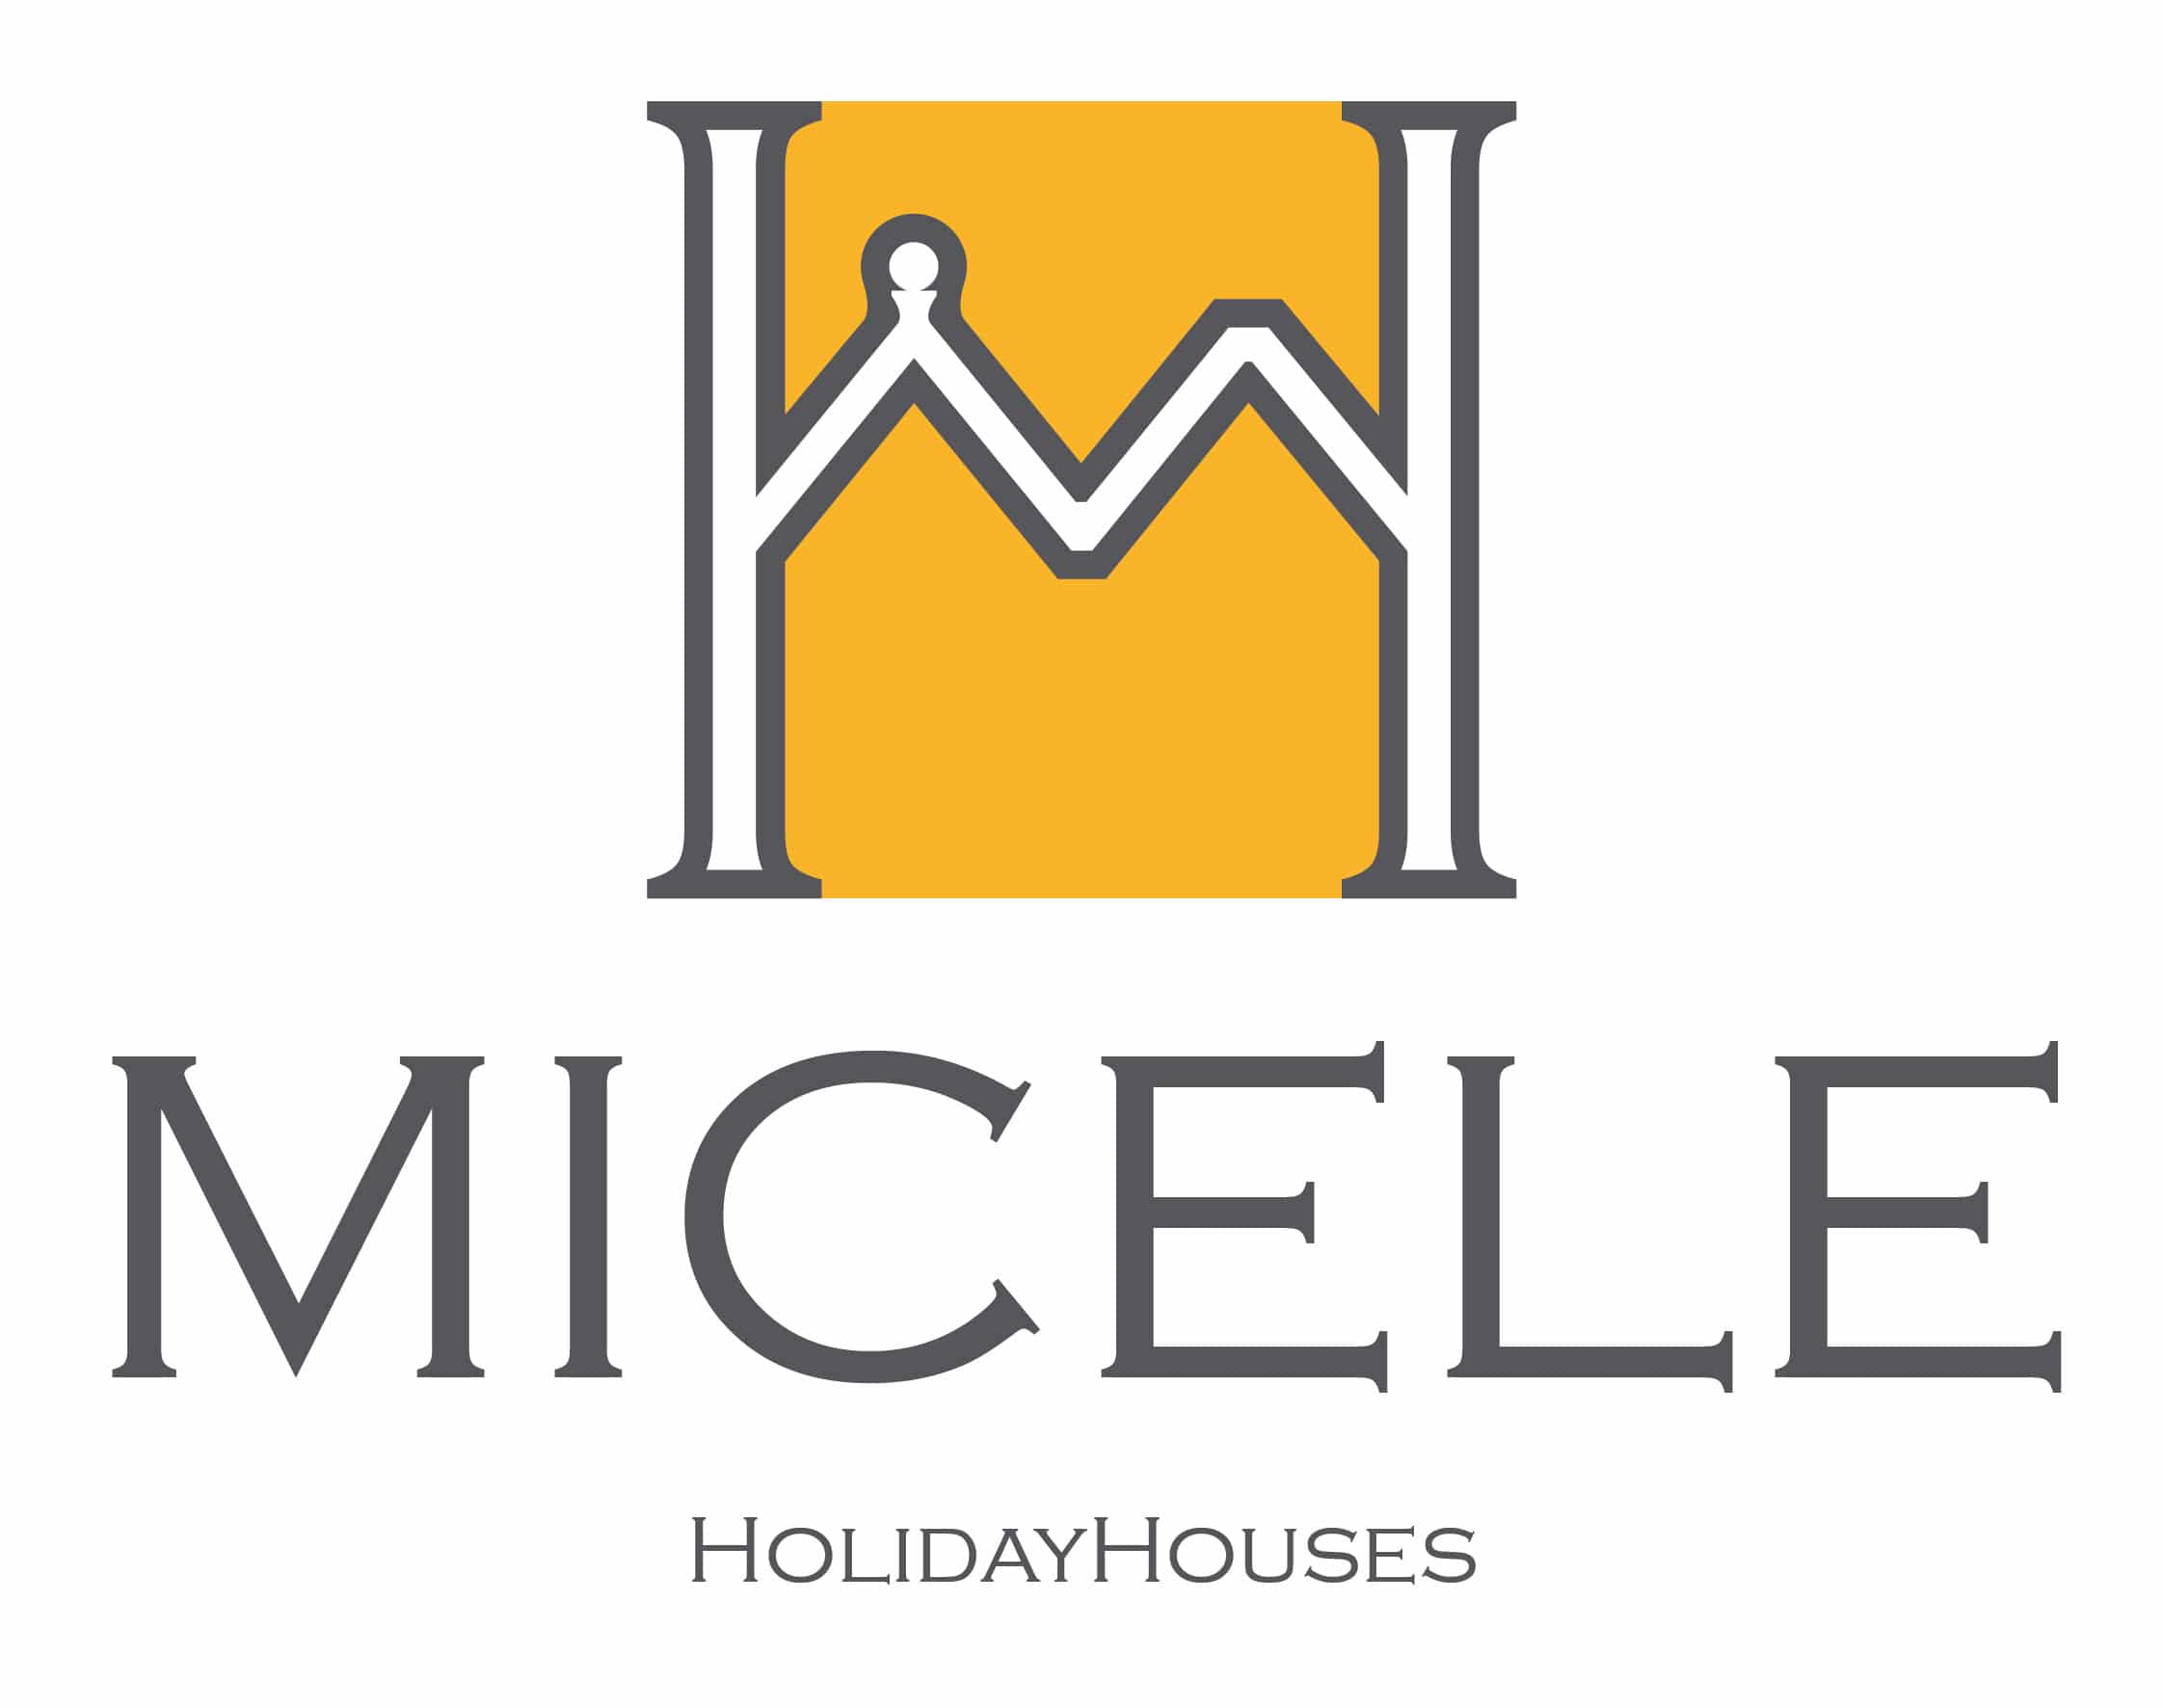 Micele Holiday Houses